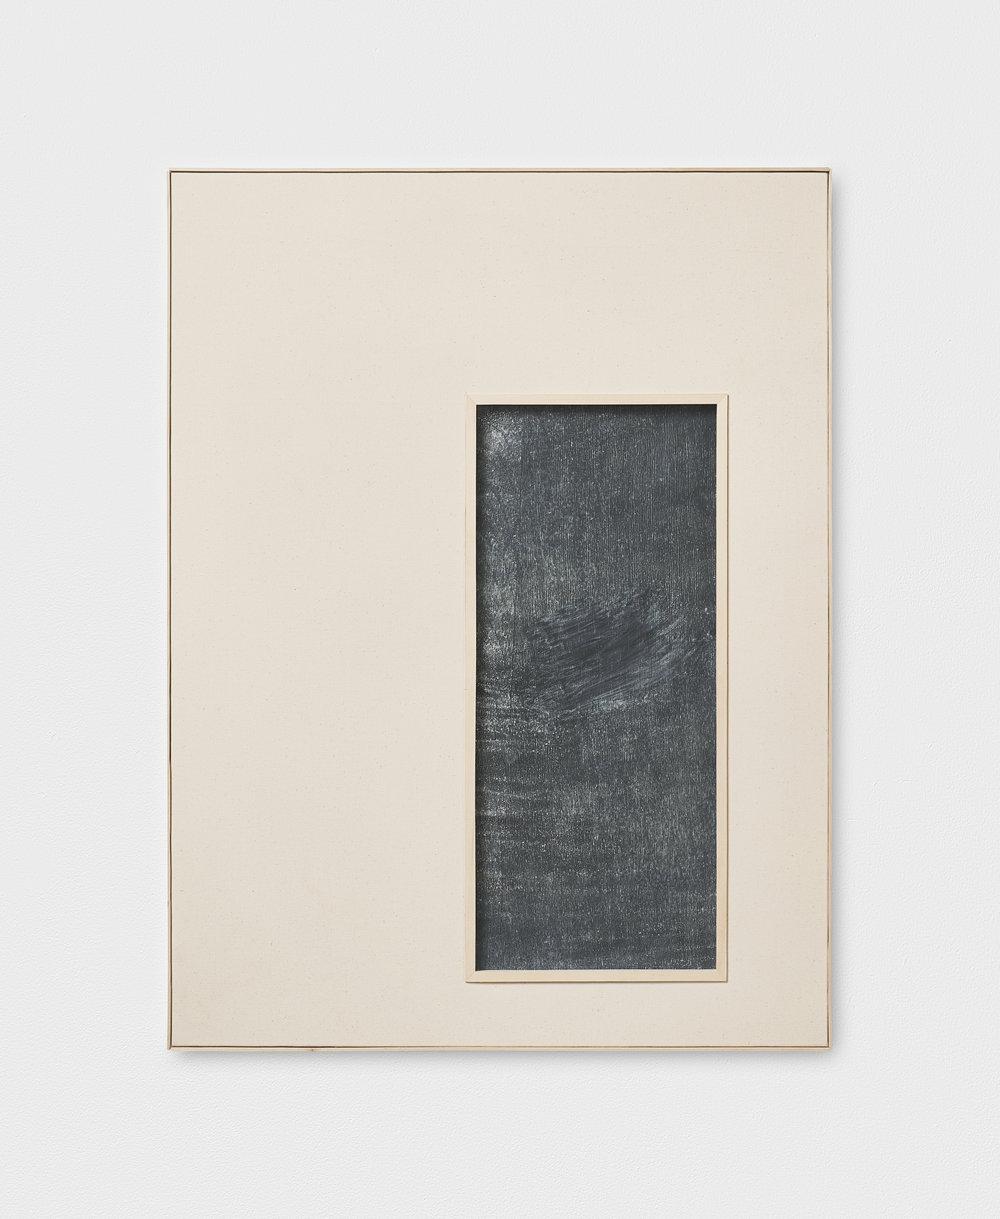 L. S. S. L. D. L' A., XIX | 2016 | Leinen, Kreidetafellack hinter Glas, Künstlerrahmung | 81 x 61 x 3.5 cm | ©GALERIE ALBER